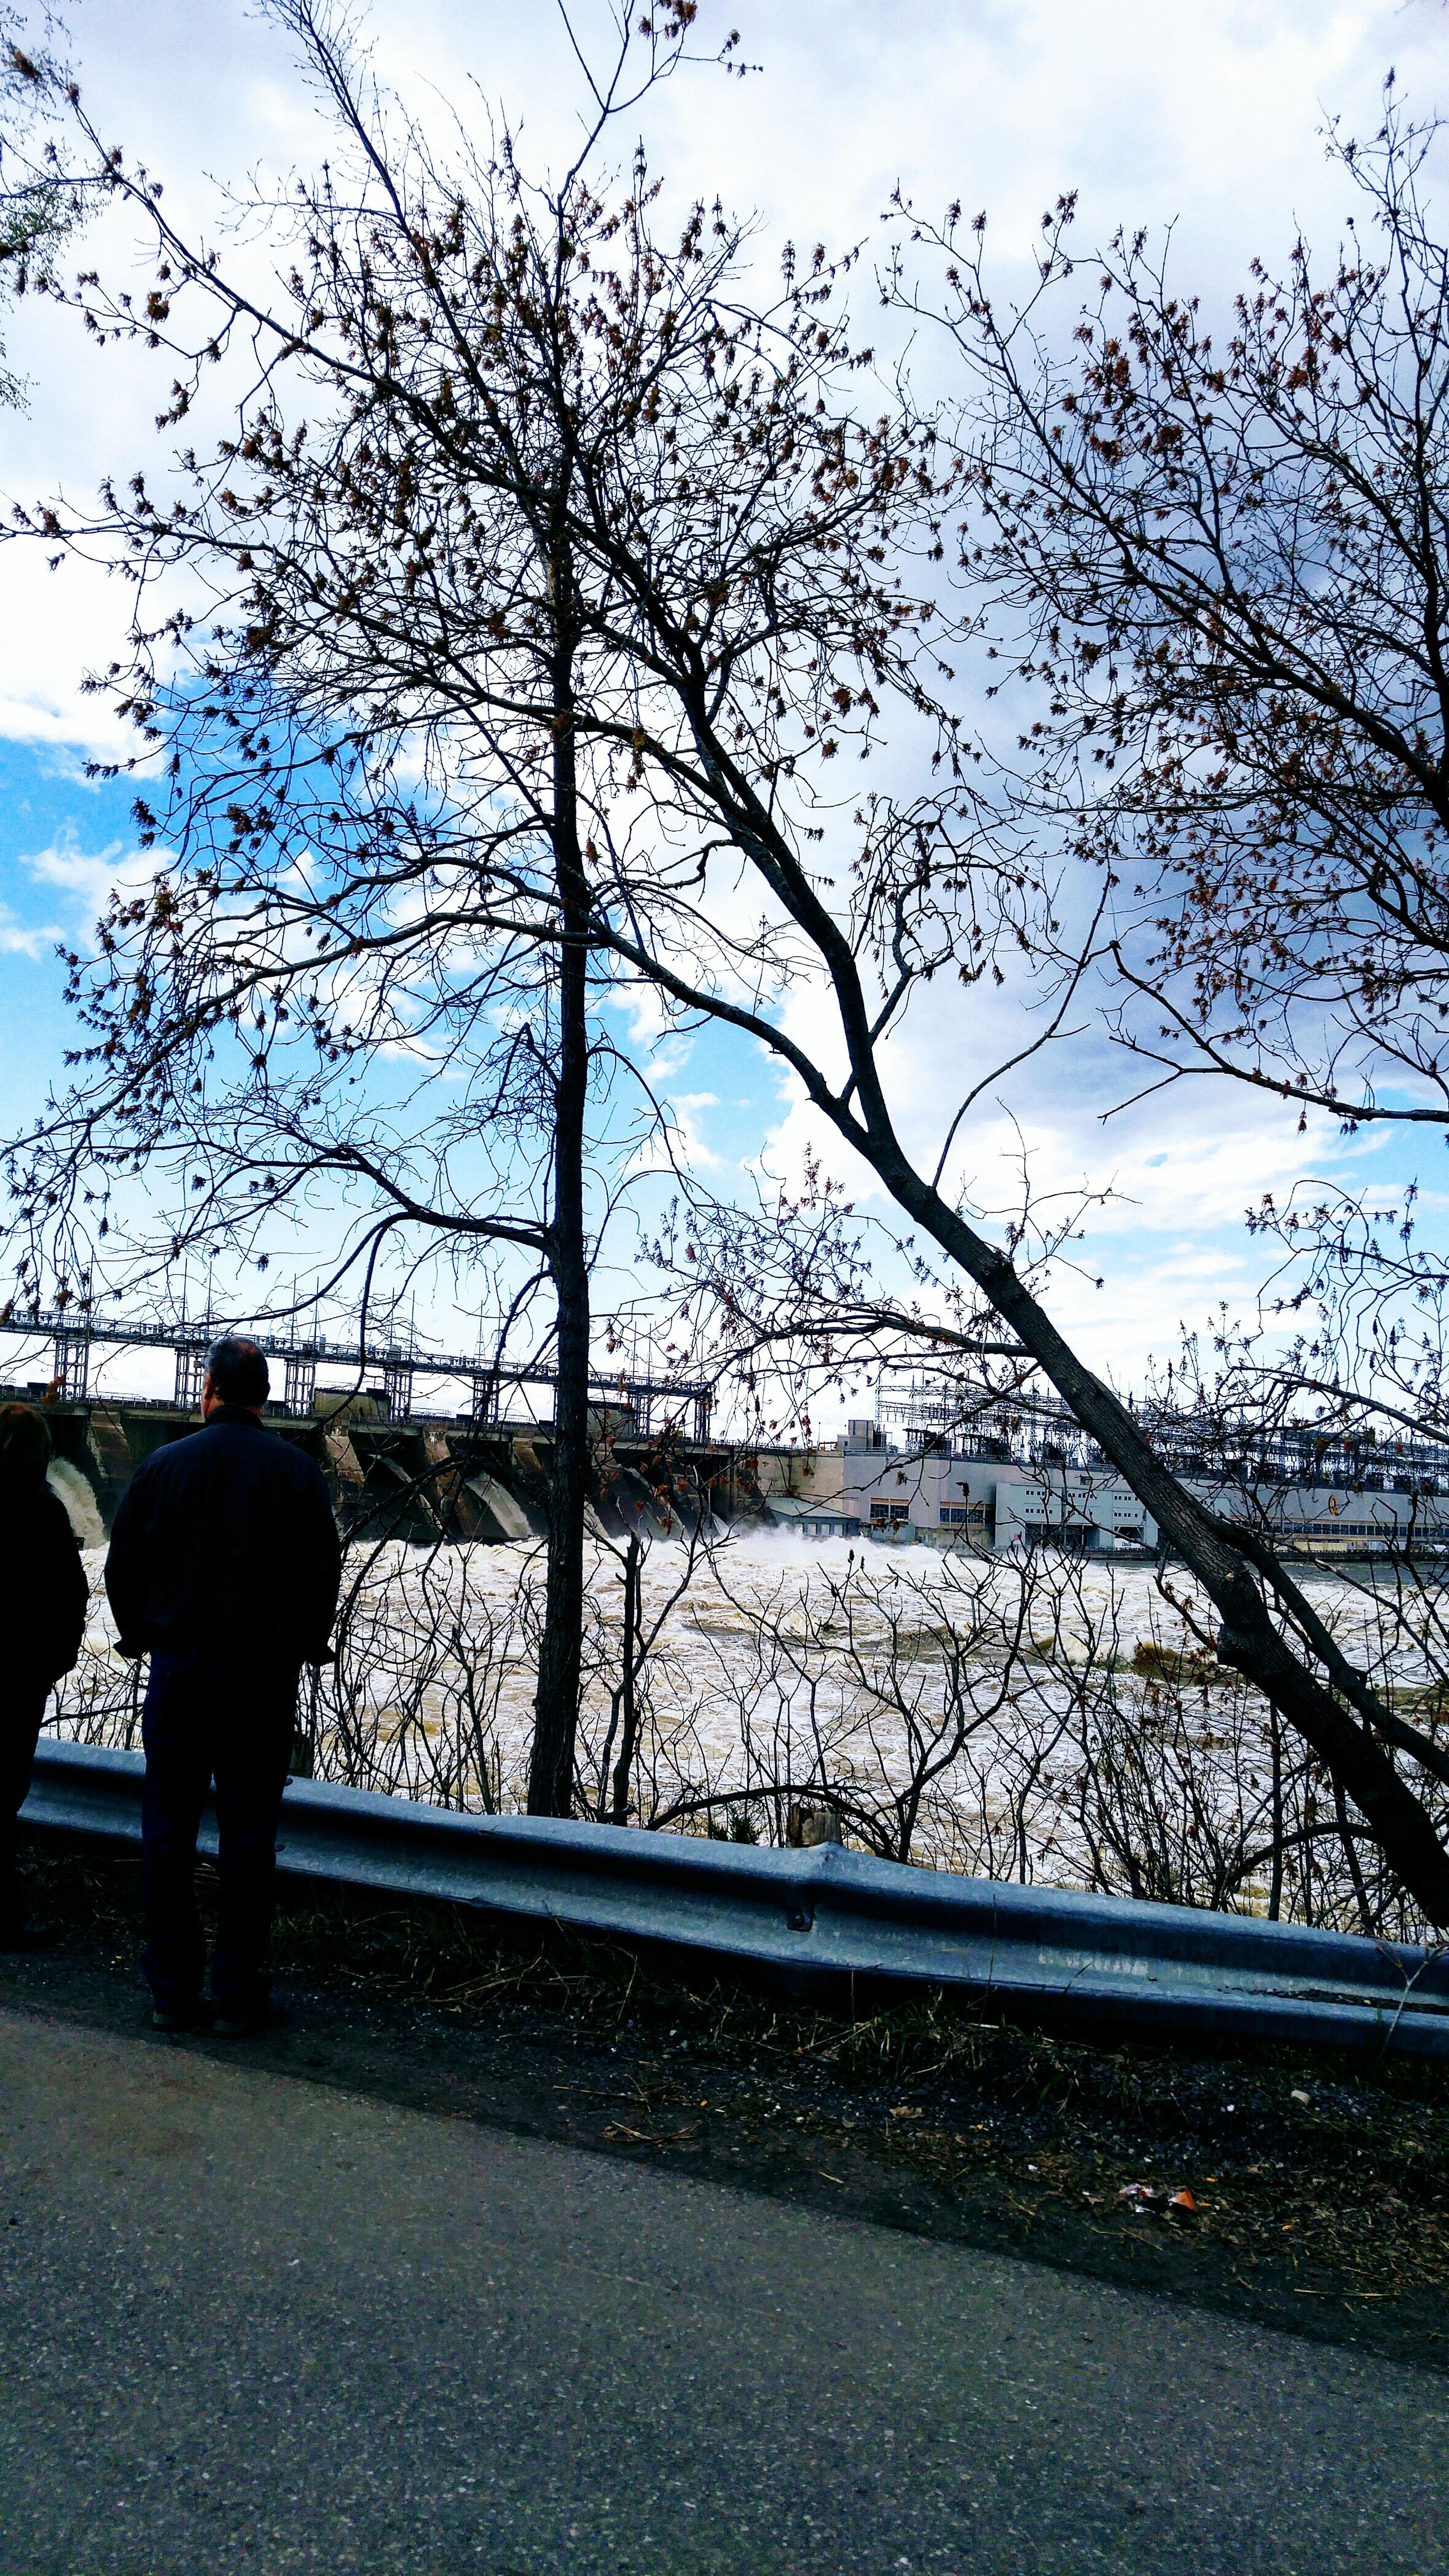 Photo prise le 6 Mai 2017 barrage hydro a Carillon,inondation.. Rural Scene Bleu Sky PhotosophLav Mesphotos Mes Photos Inondation Rigaud Nature Photo♡ Printemps 🌼 Building Exterior